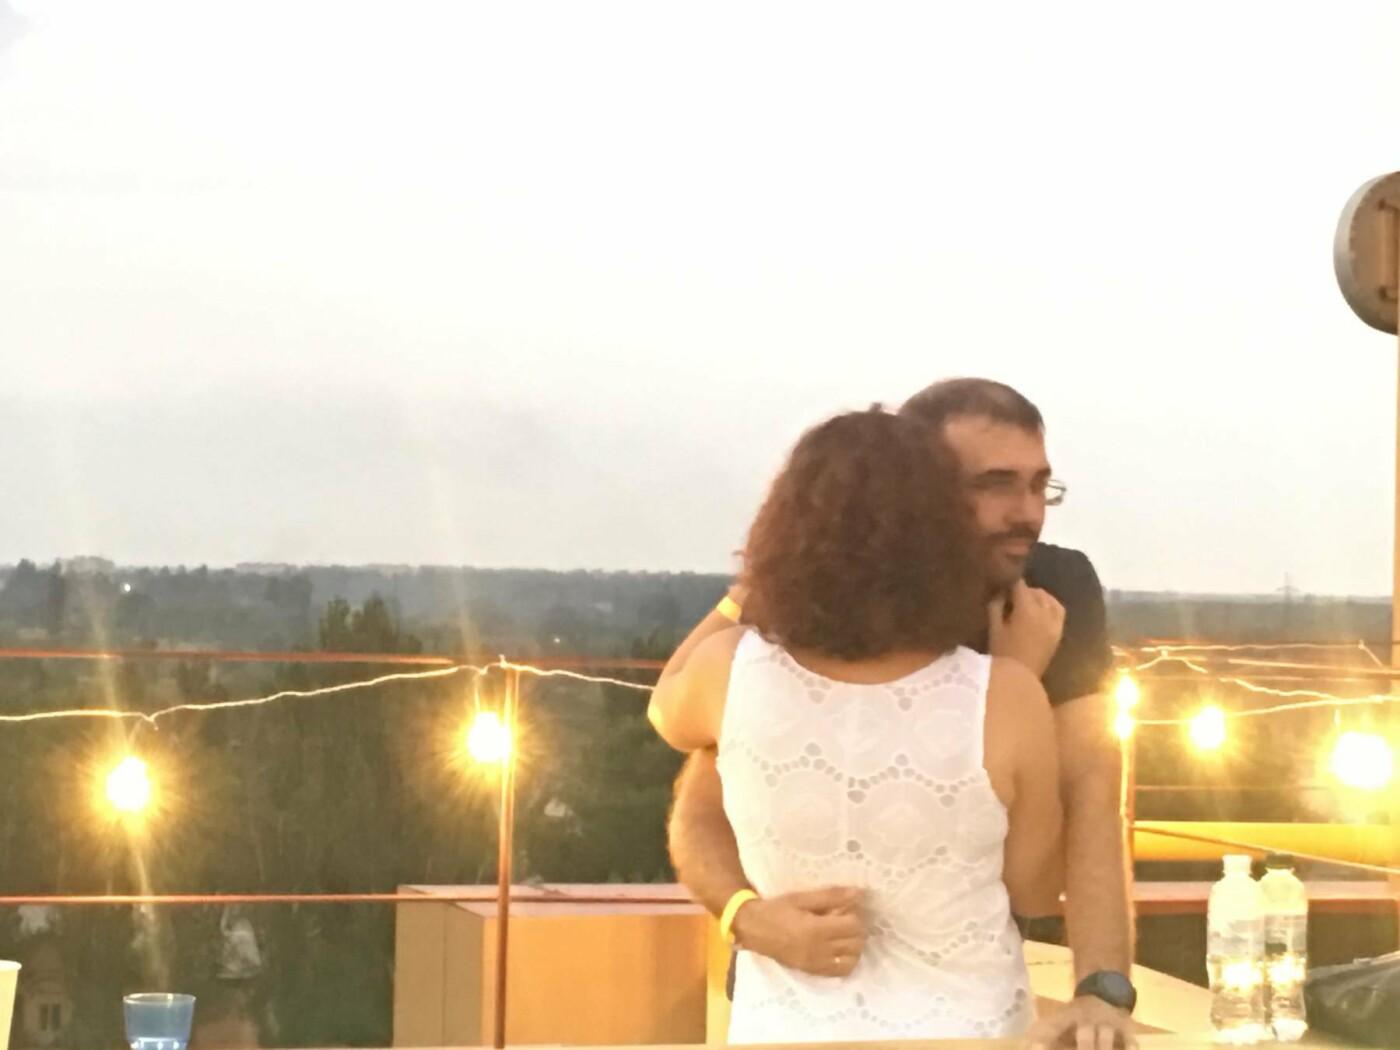 Сотни криворожан встречали закат на крыше отеля под мелодии джаза, - ФОТО, ВИДЕО, фото-1